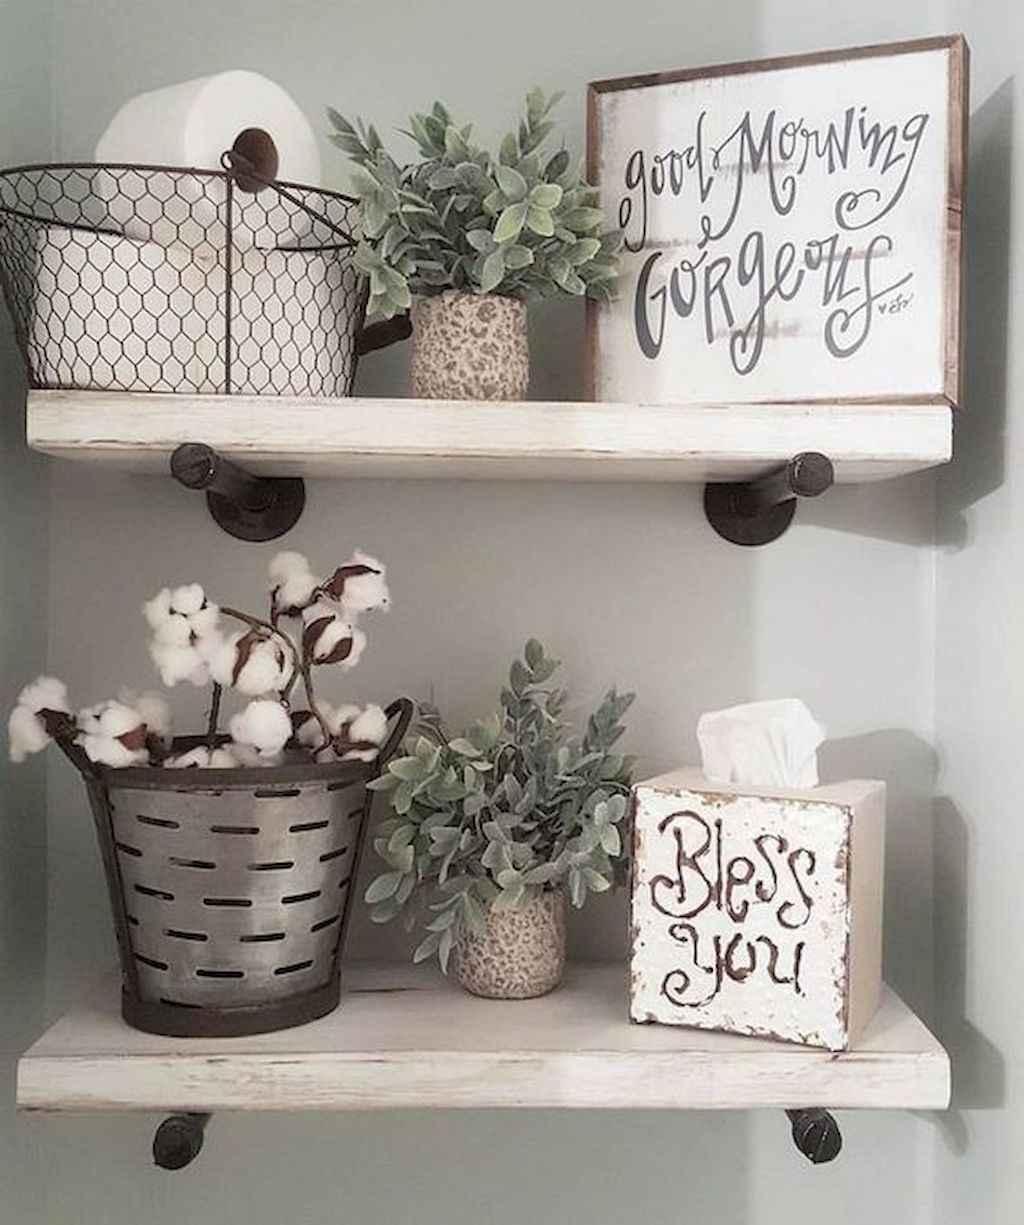 Inspiring rustic bathroom decor ideas (27)